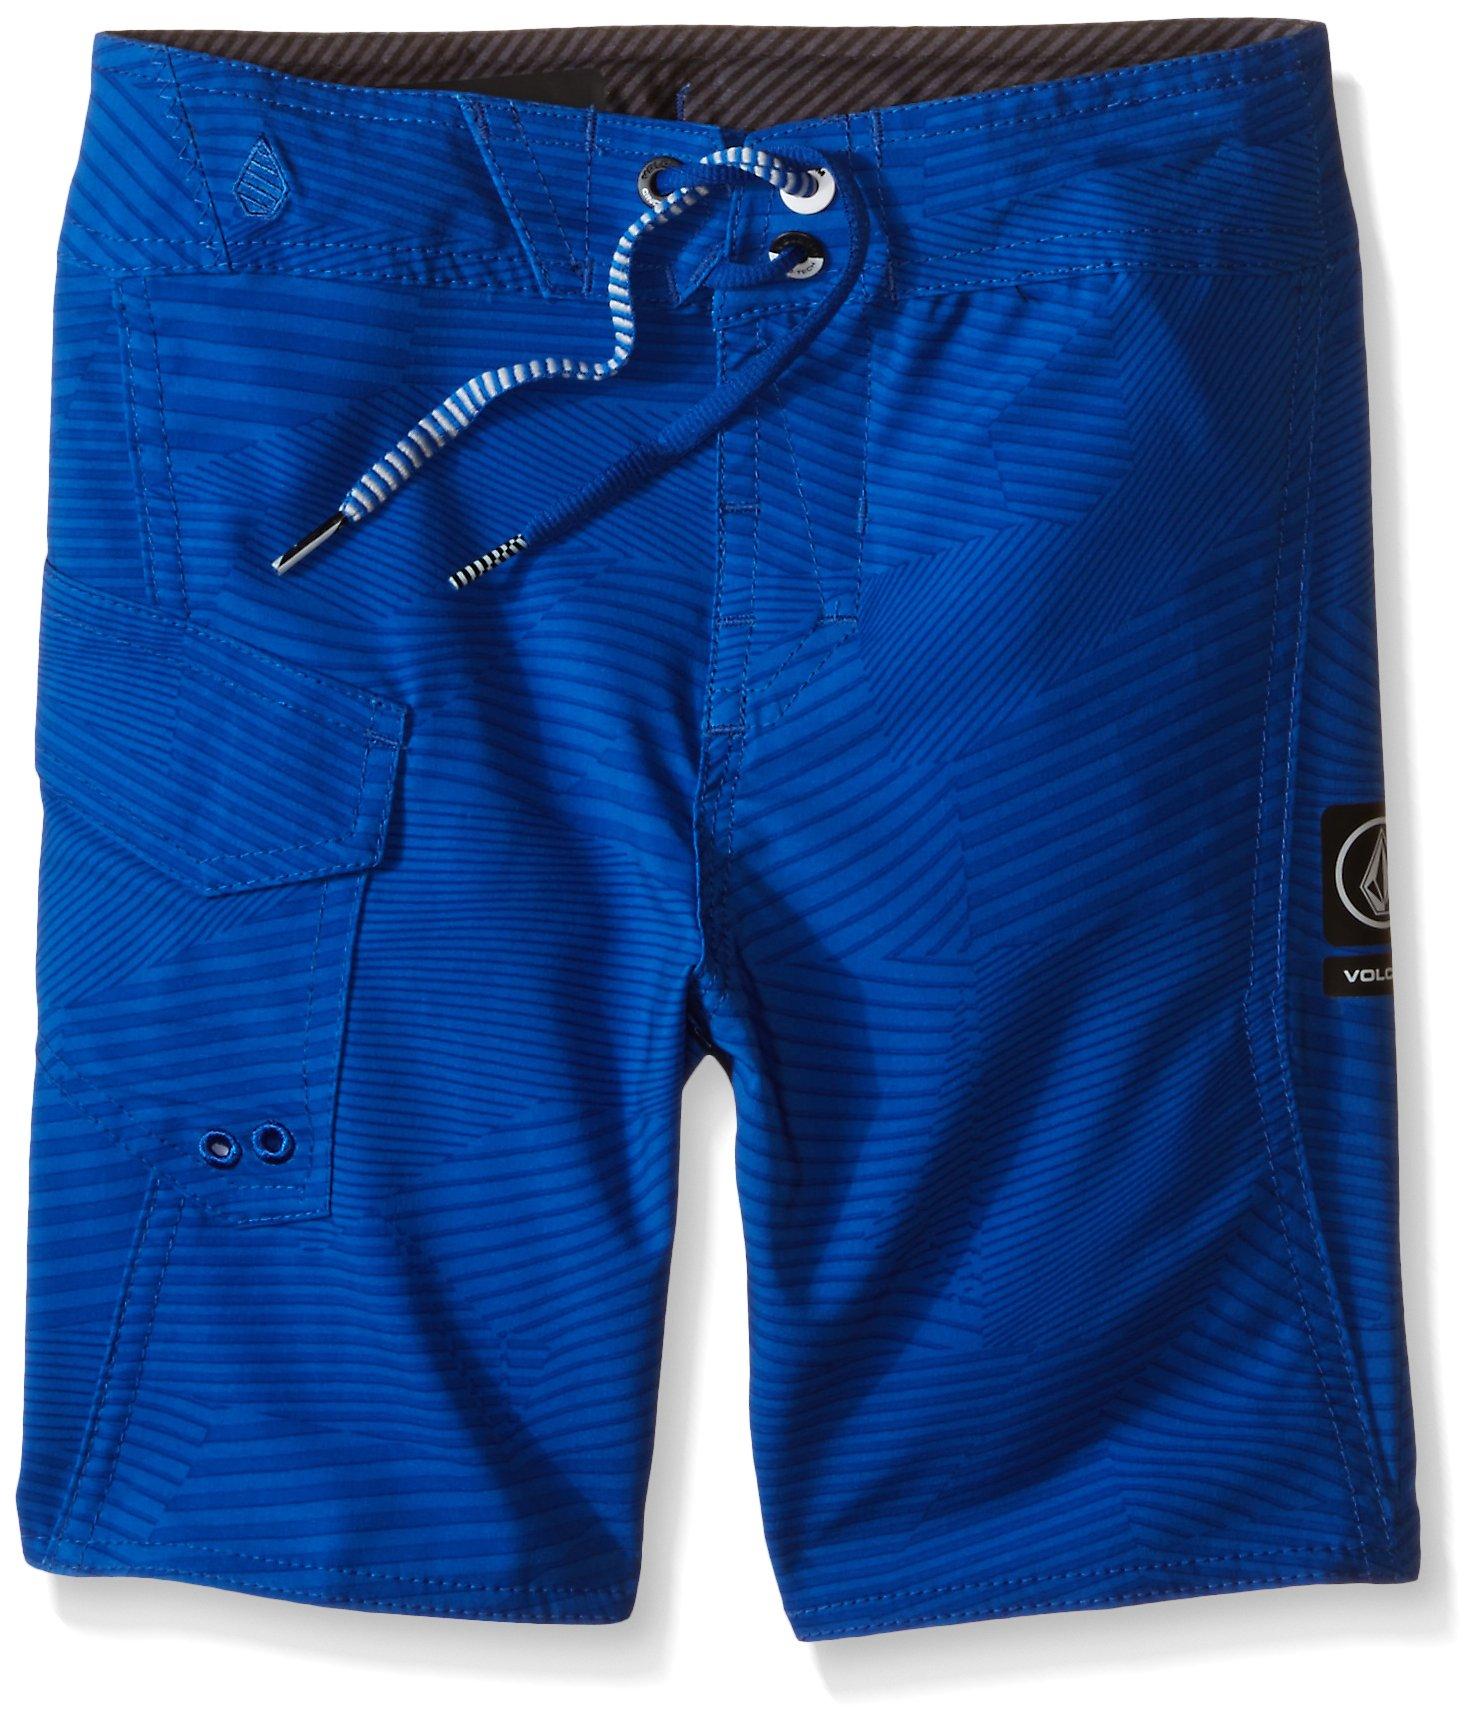 Volcom Little Boys' Stone Mod Boardshort, Estate Blue, 7X